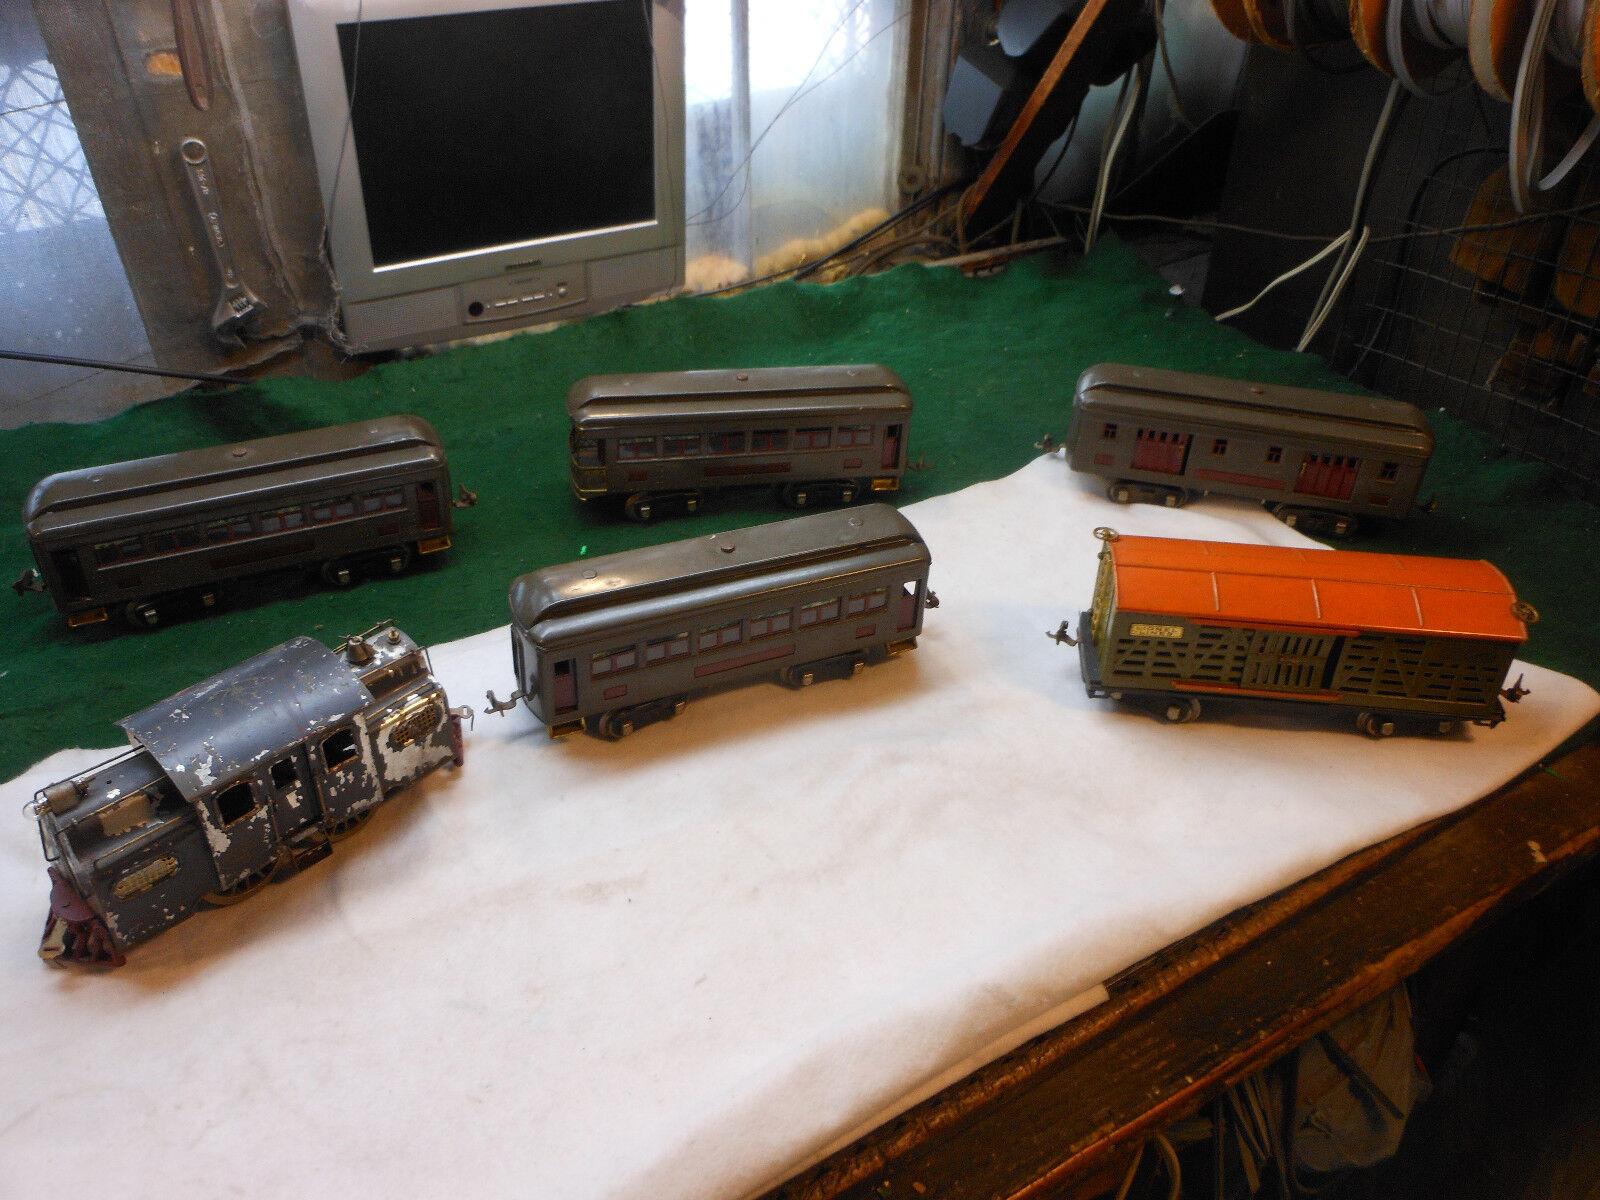 Vintage Lionel Train Lot Prewar Standard Gauge - 332 341 (2X339)  513 (38 Motor)